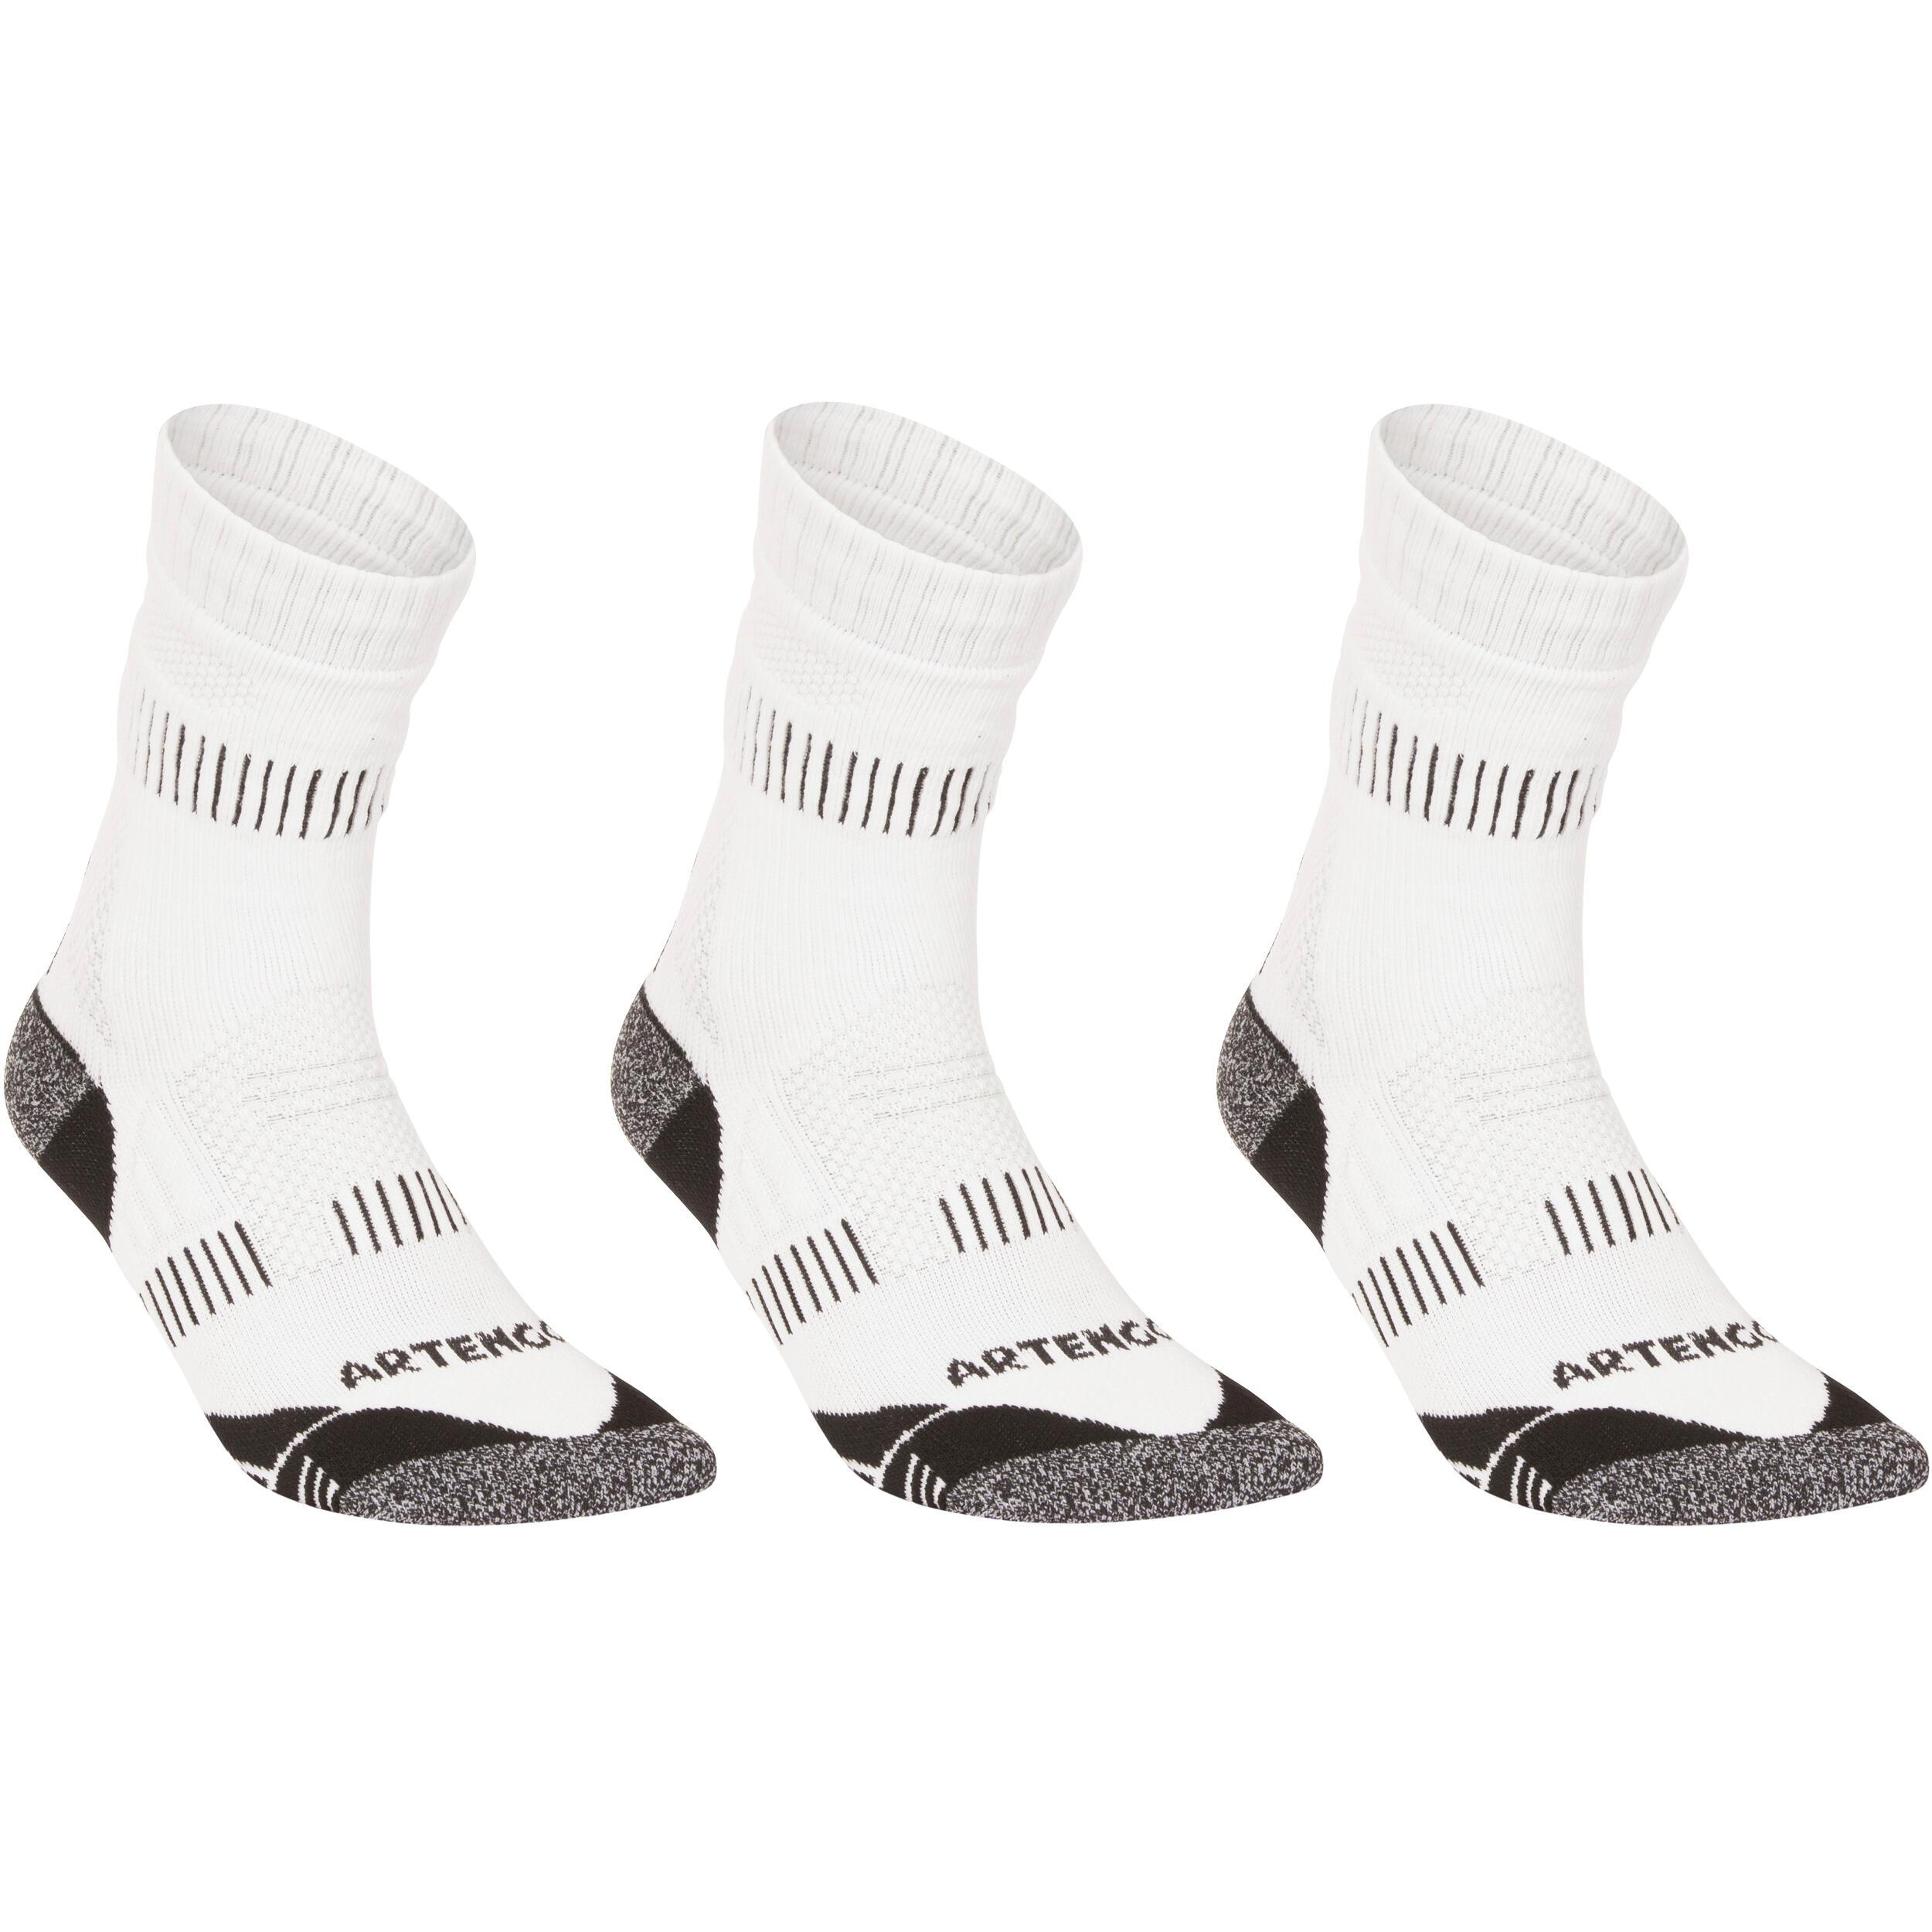 RS 900 Adult High Sport Socks 3-Pack - White/Grey